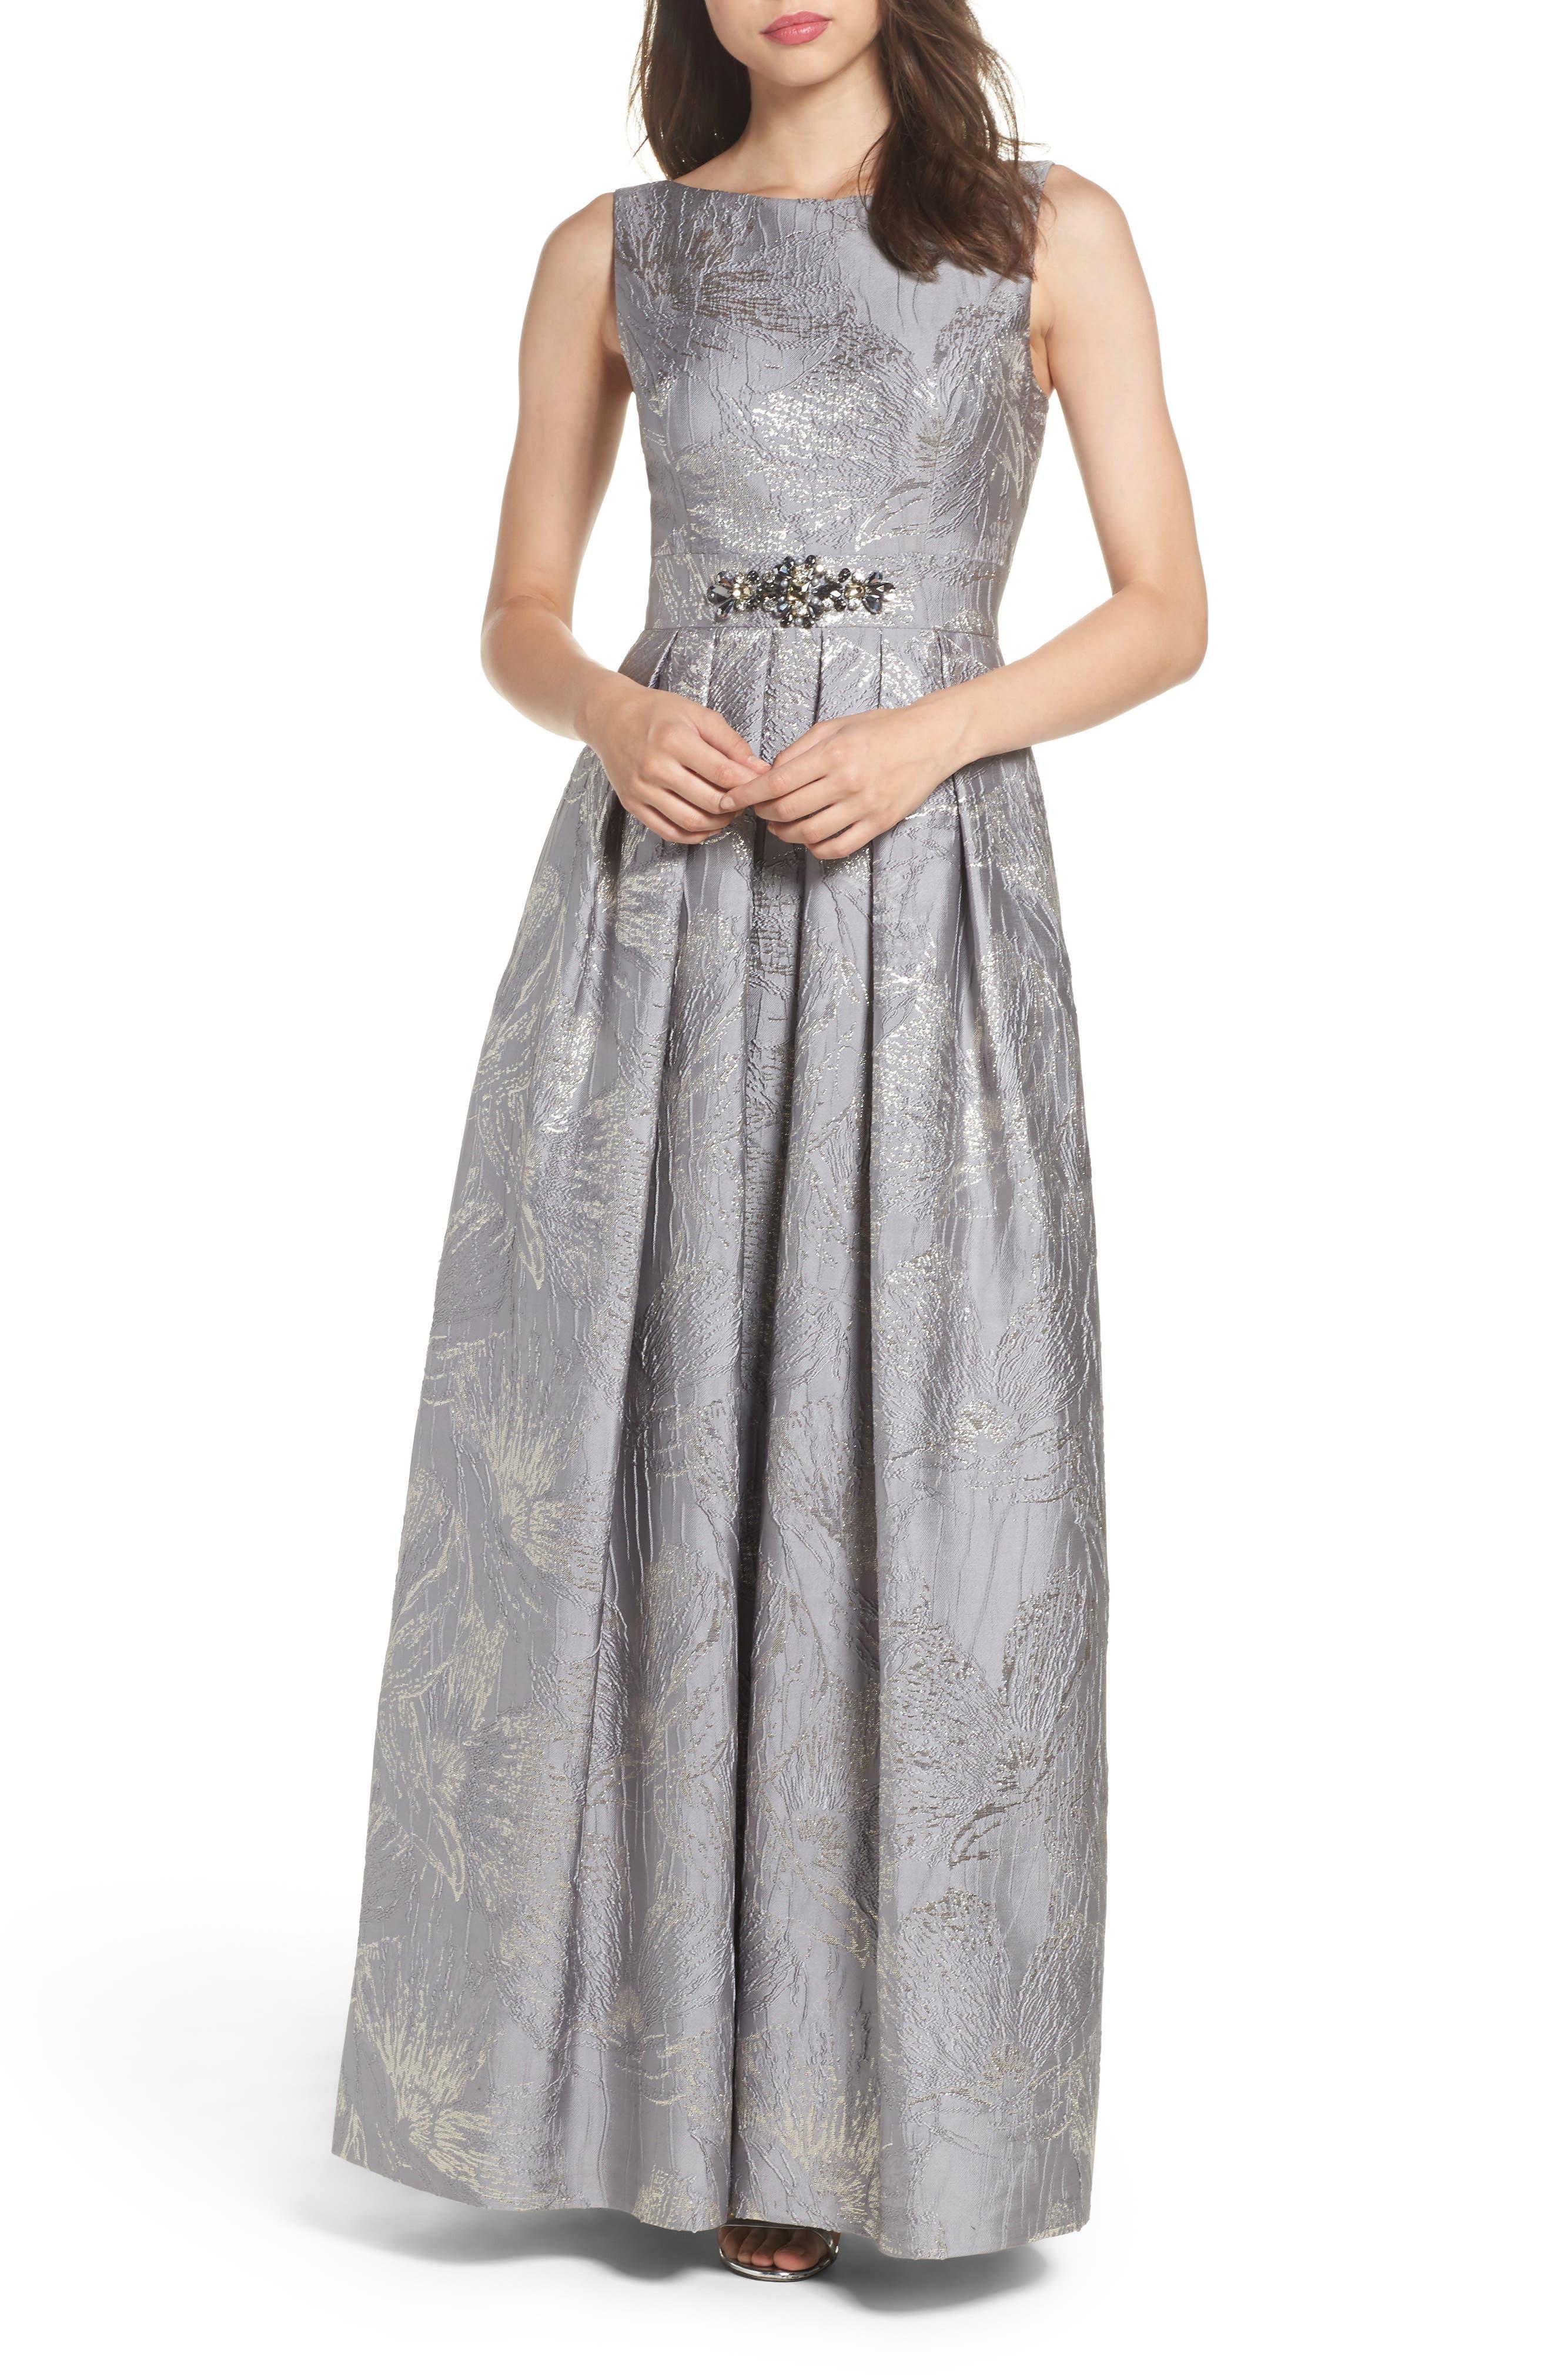 Main Image - Eliza J Embellished Brocade Ballgown